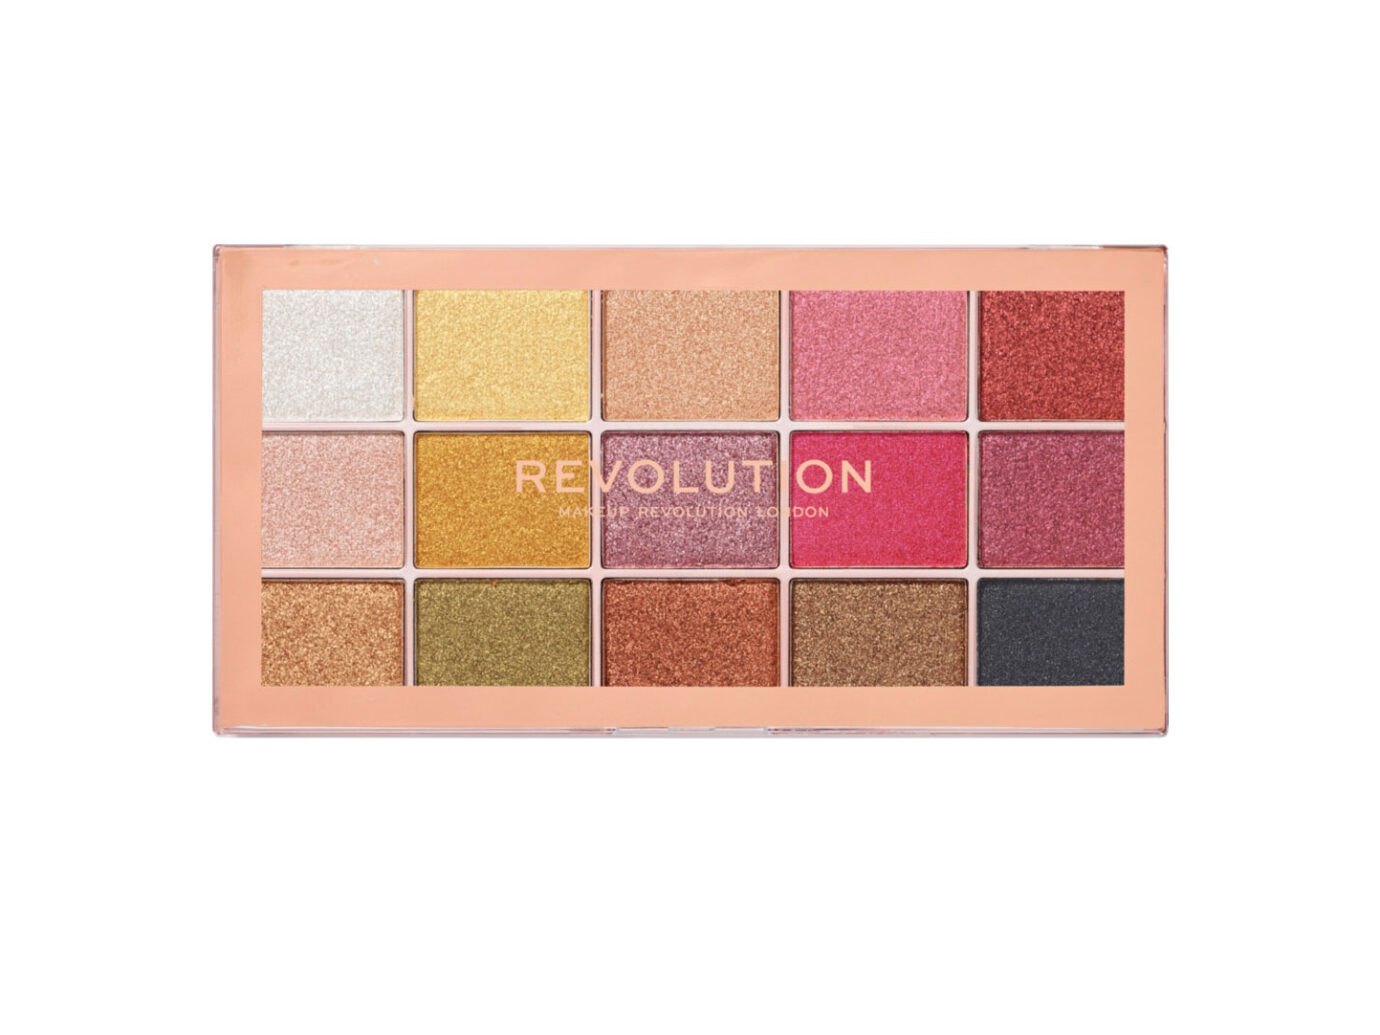 Ulta Sale Makeup Revolution Foil Frenzy Creation Eyeshadow Palette